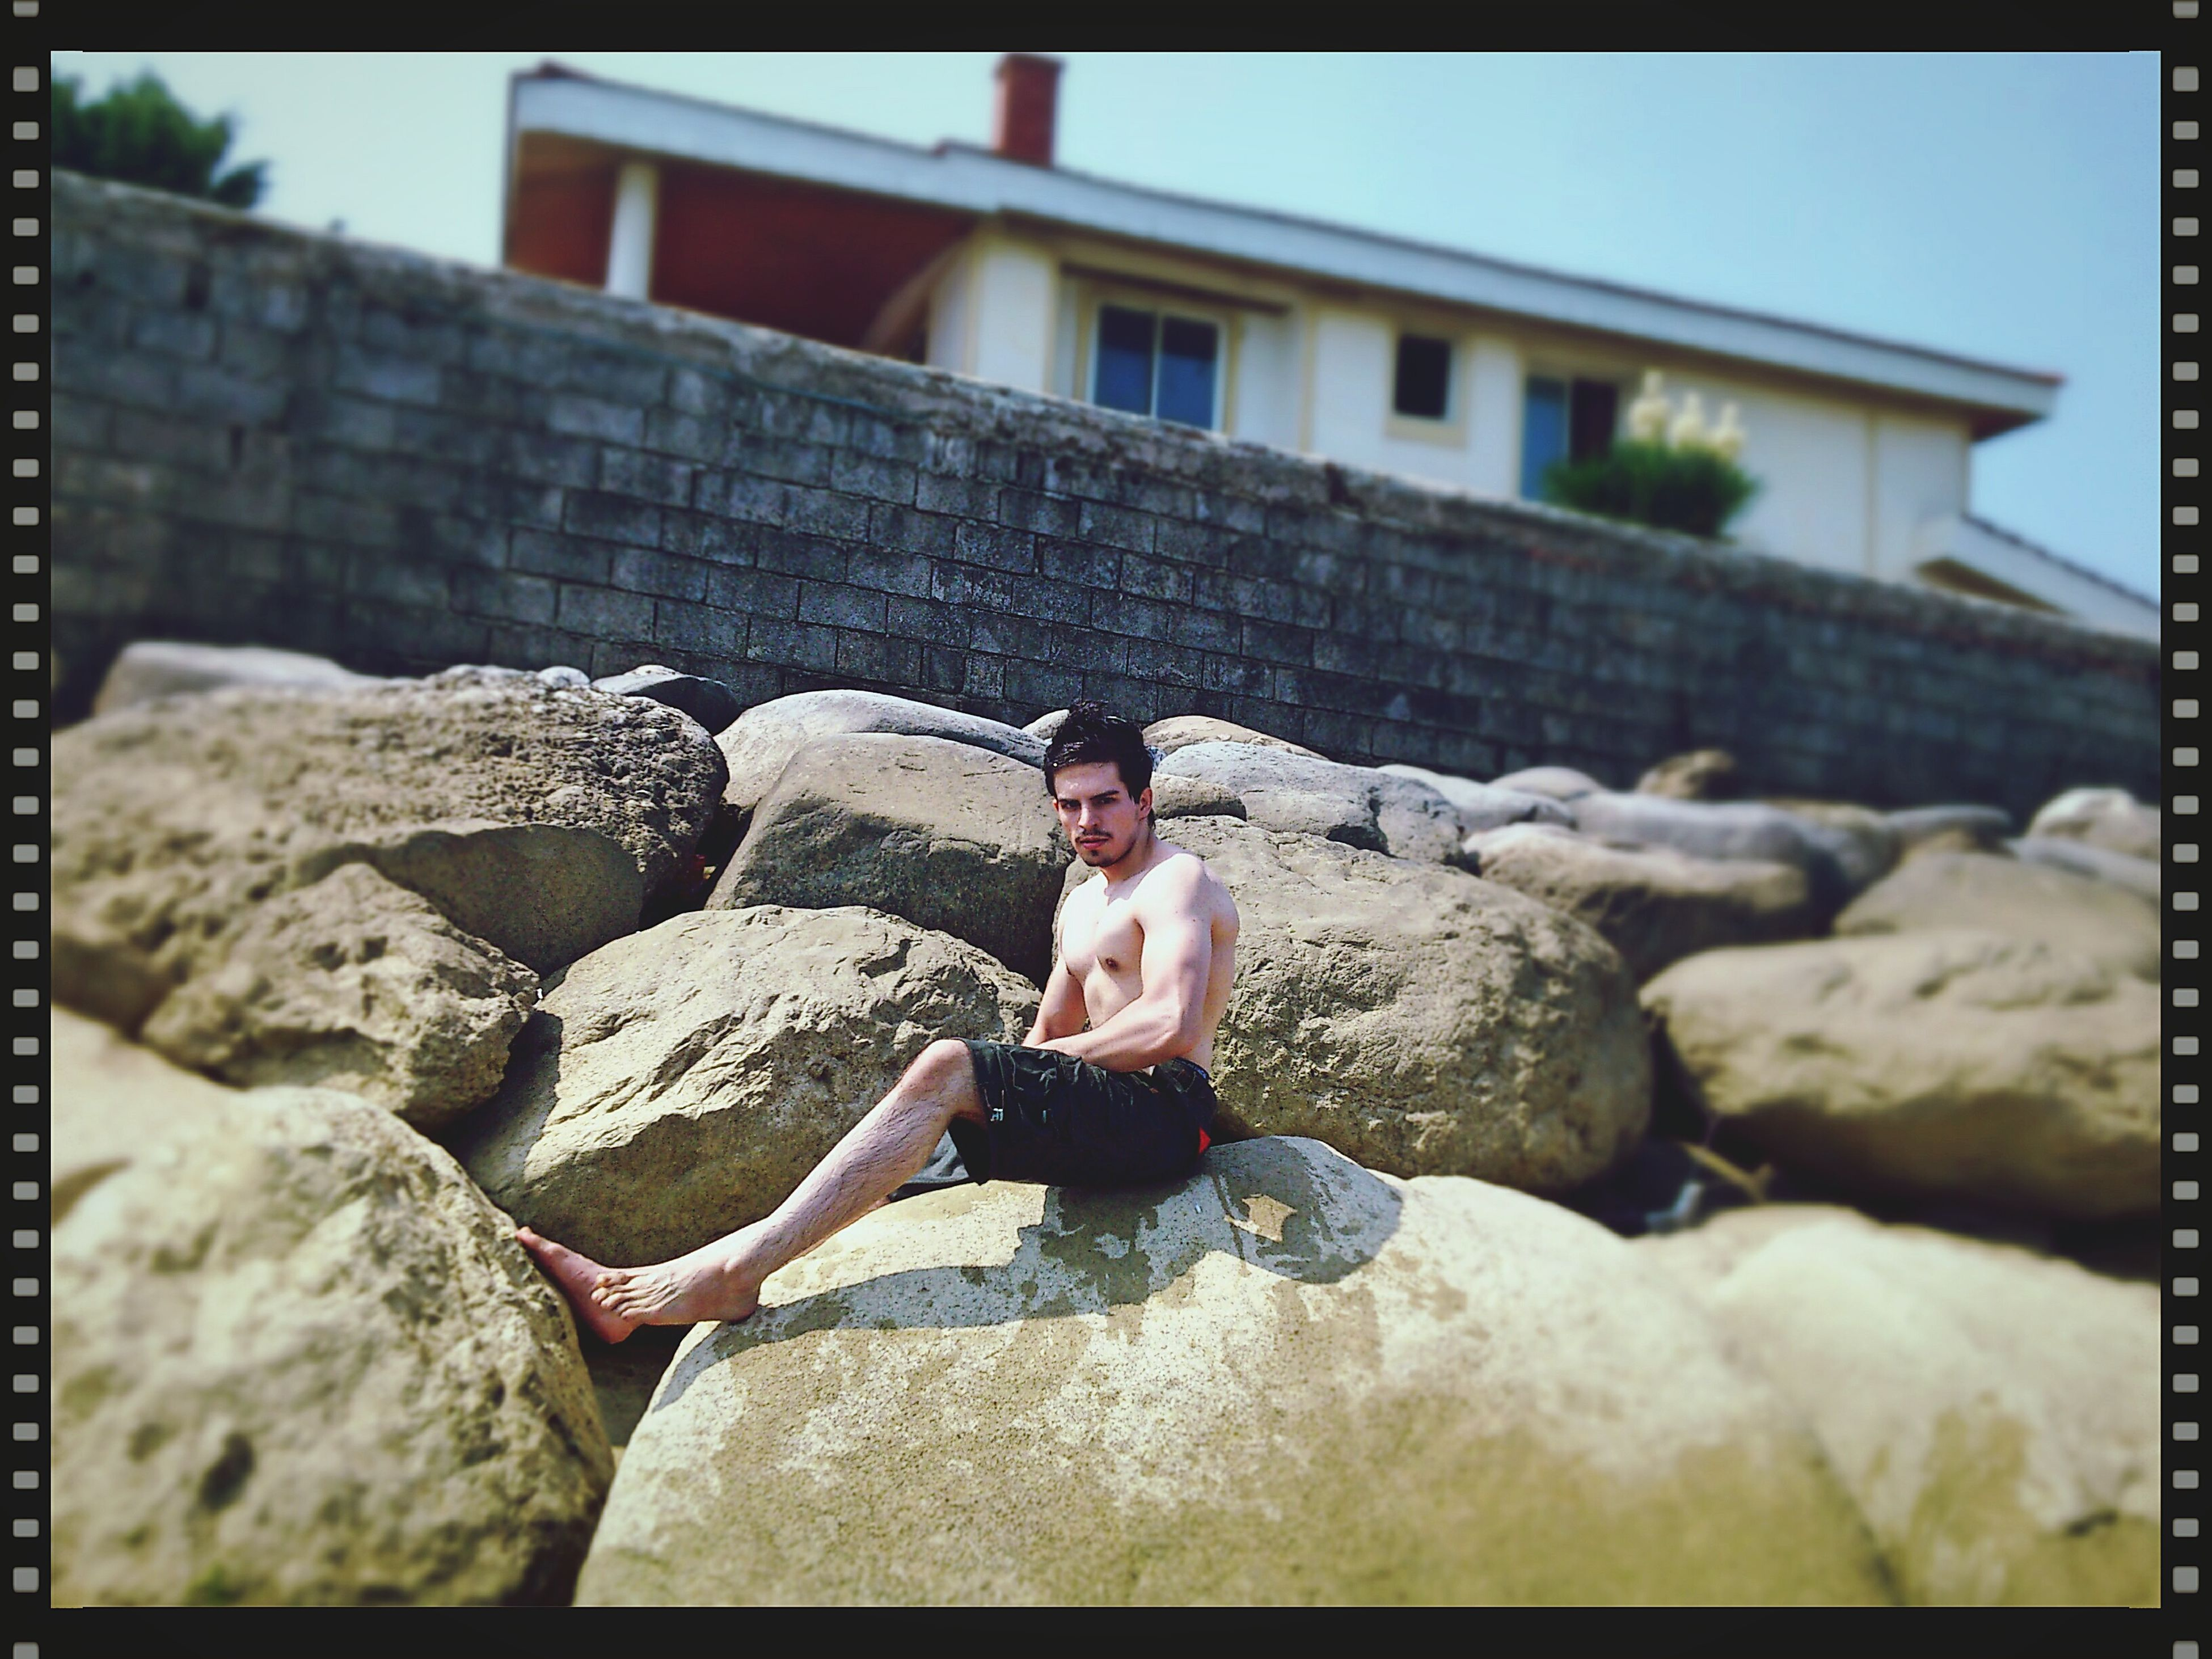 4 years ago ... beach ... Fitness ... Fashion ... Fashionphoto ??